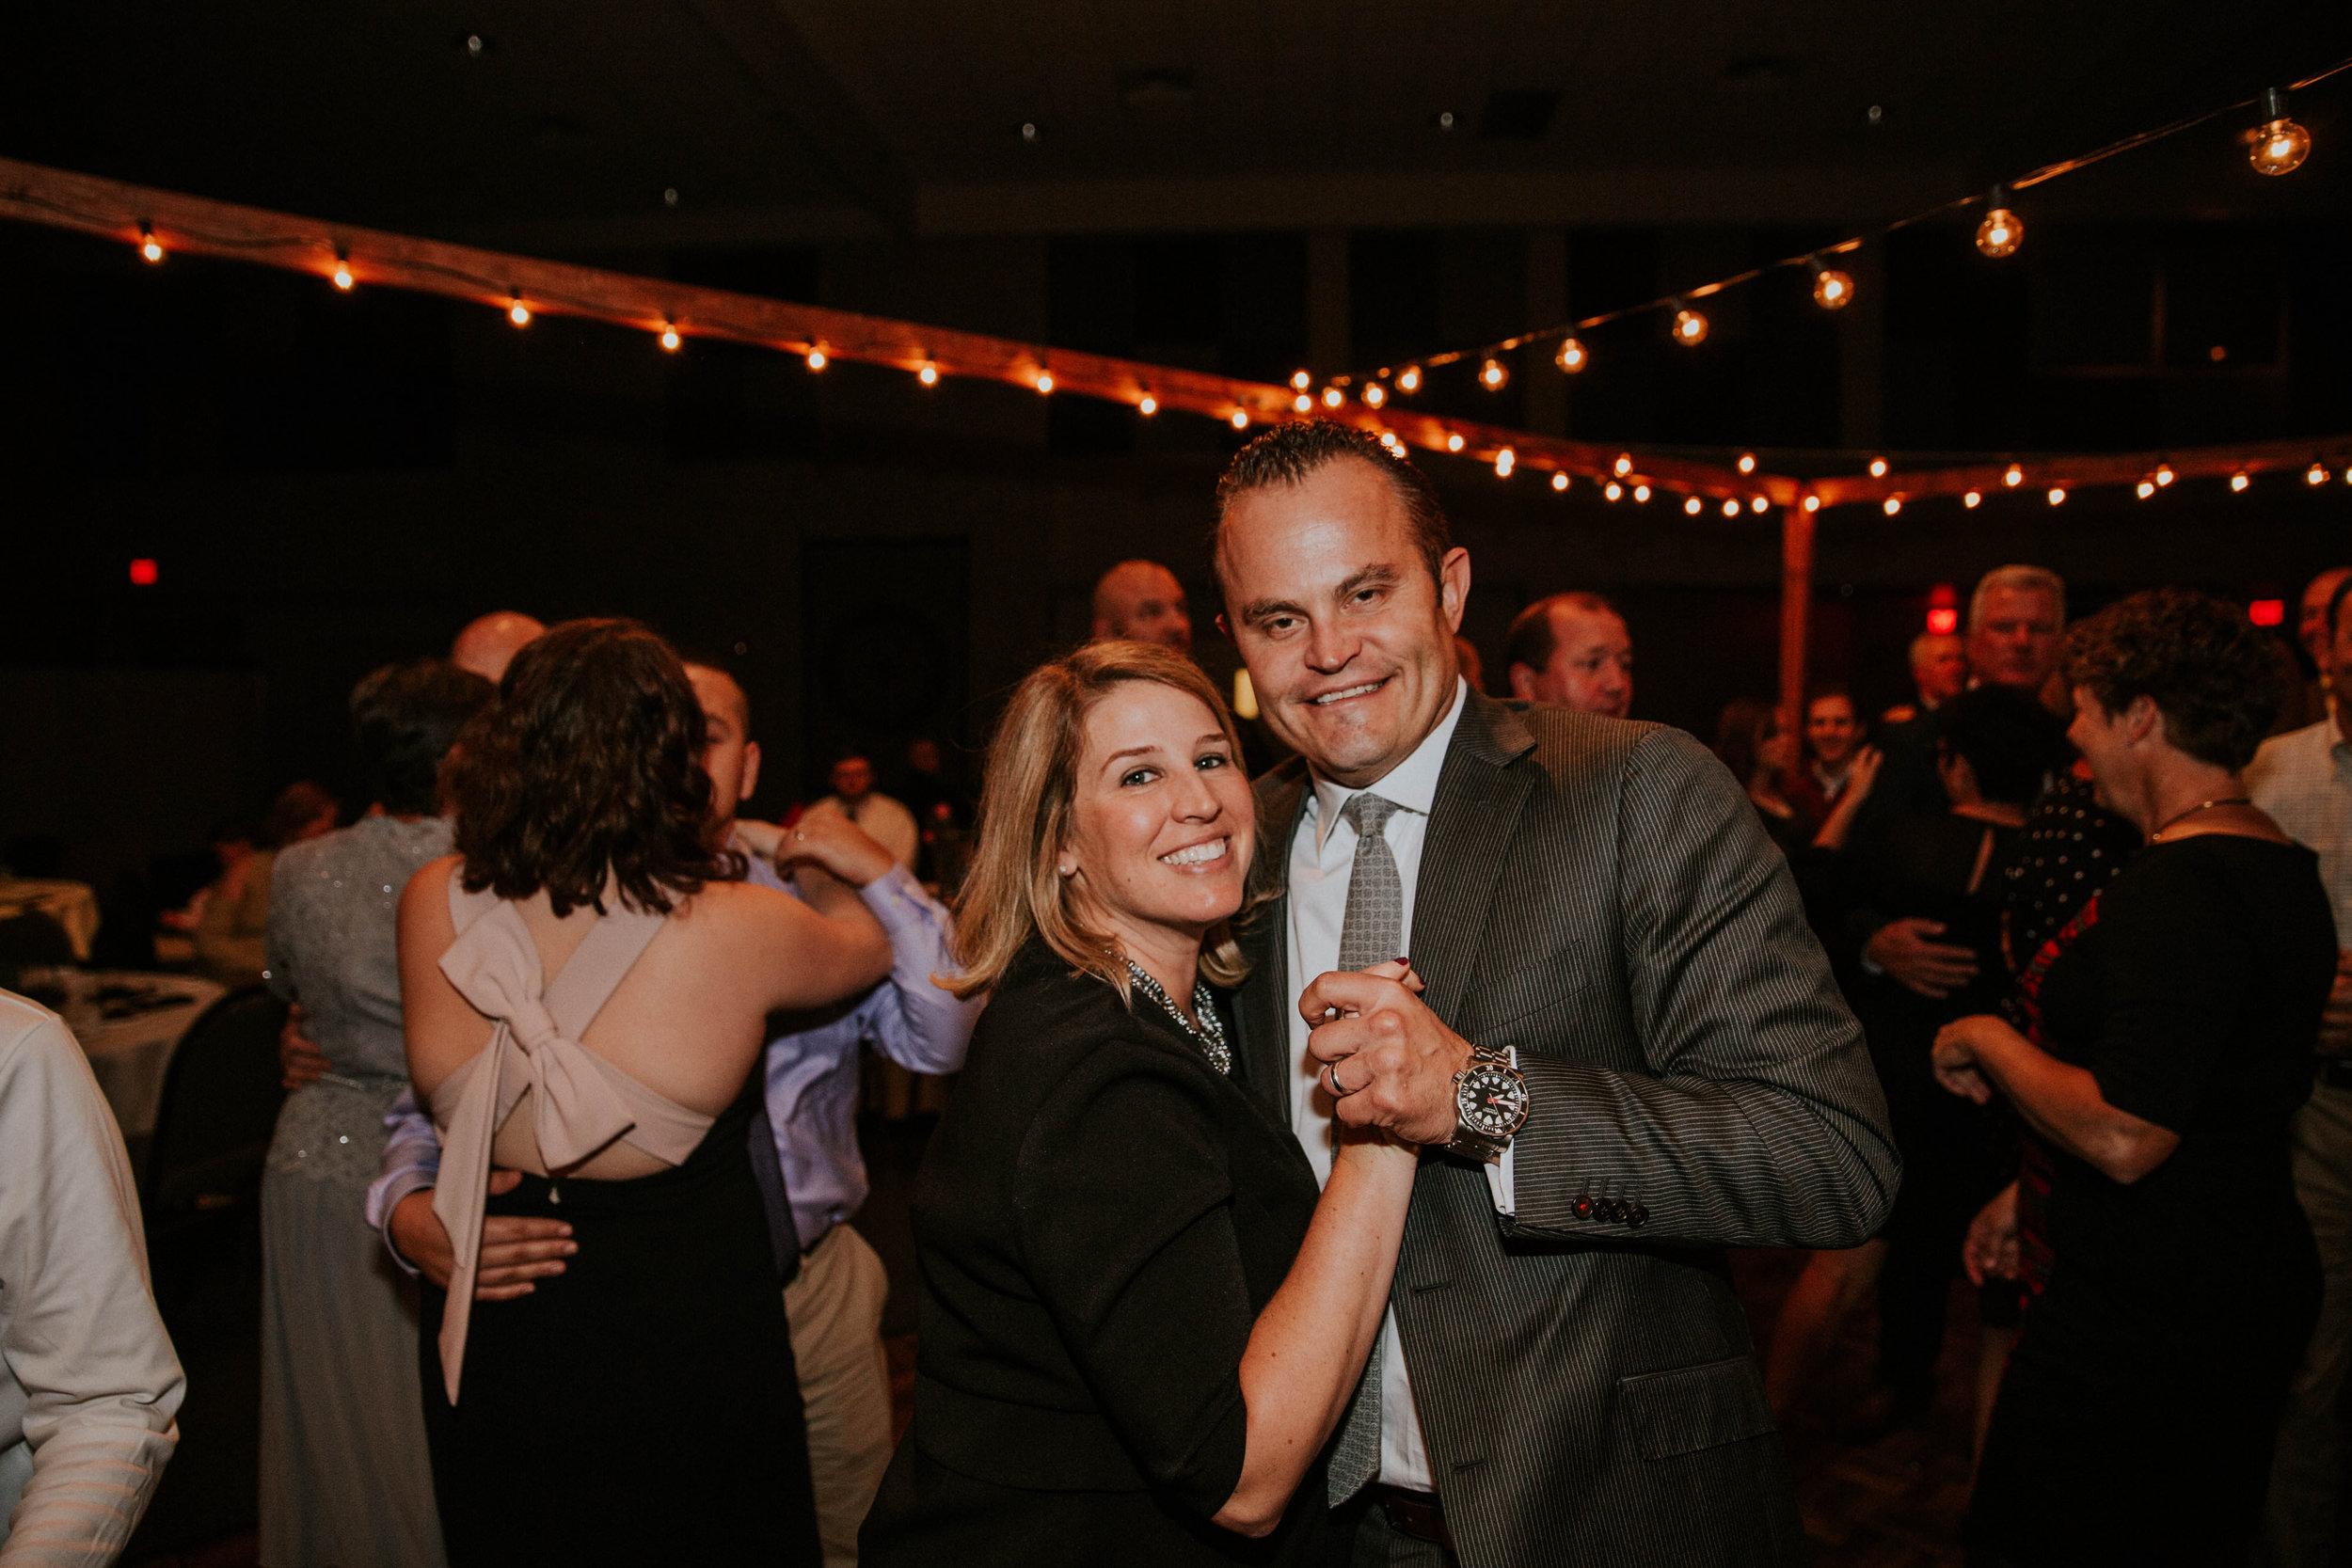 Columbus ohio wedding photographer grace e jones photography real fun joyful wedding139.jpg